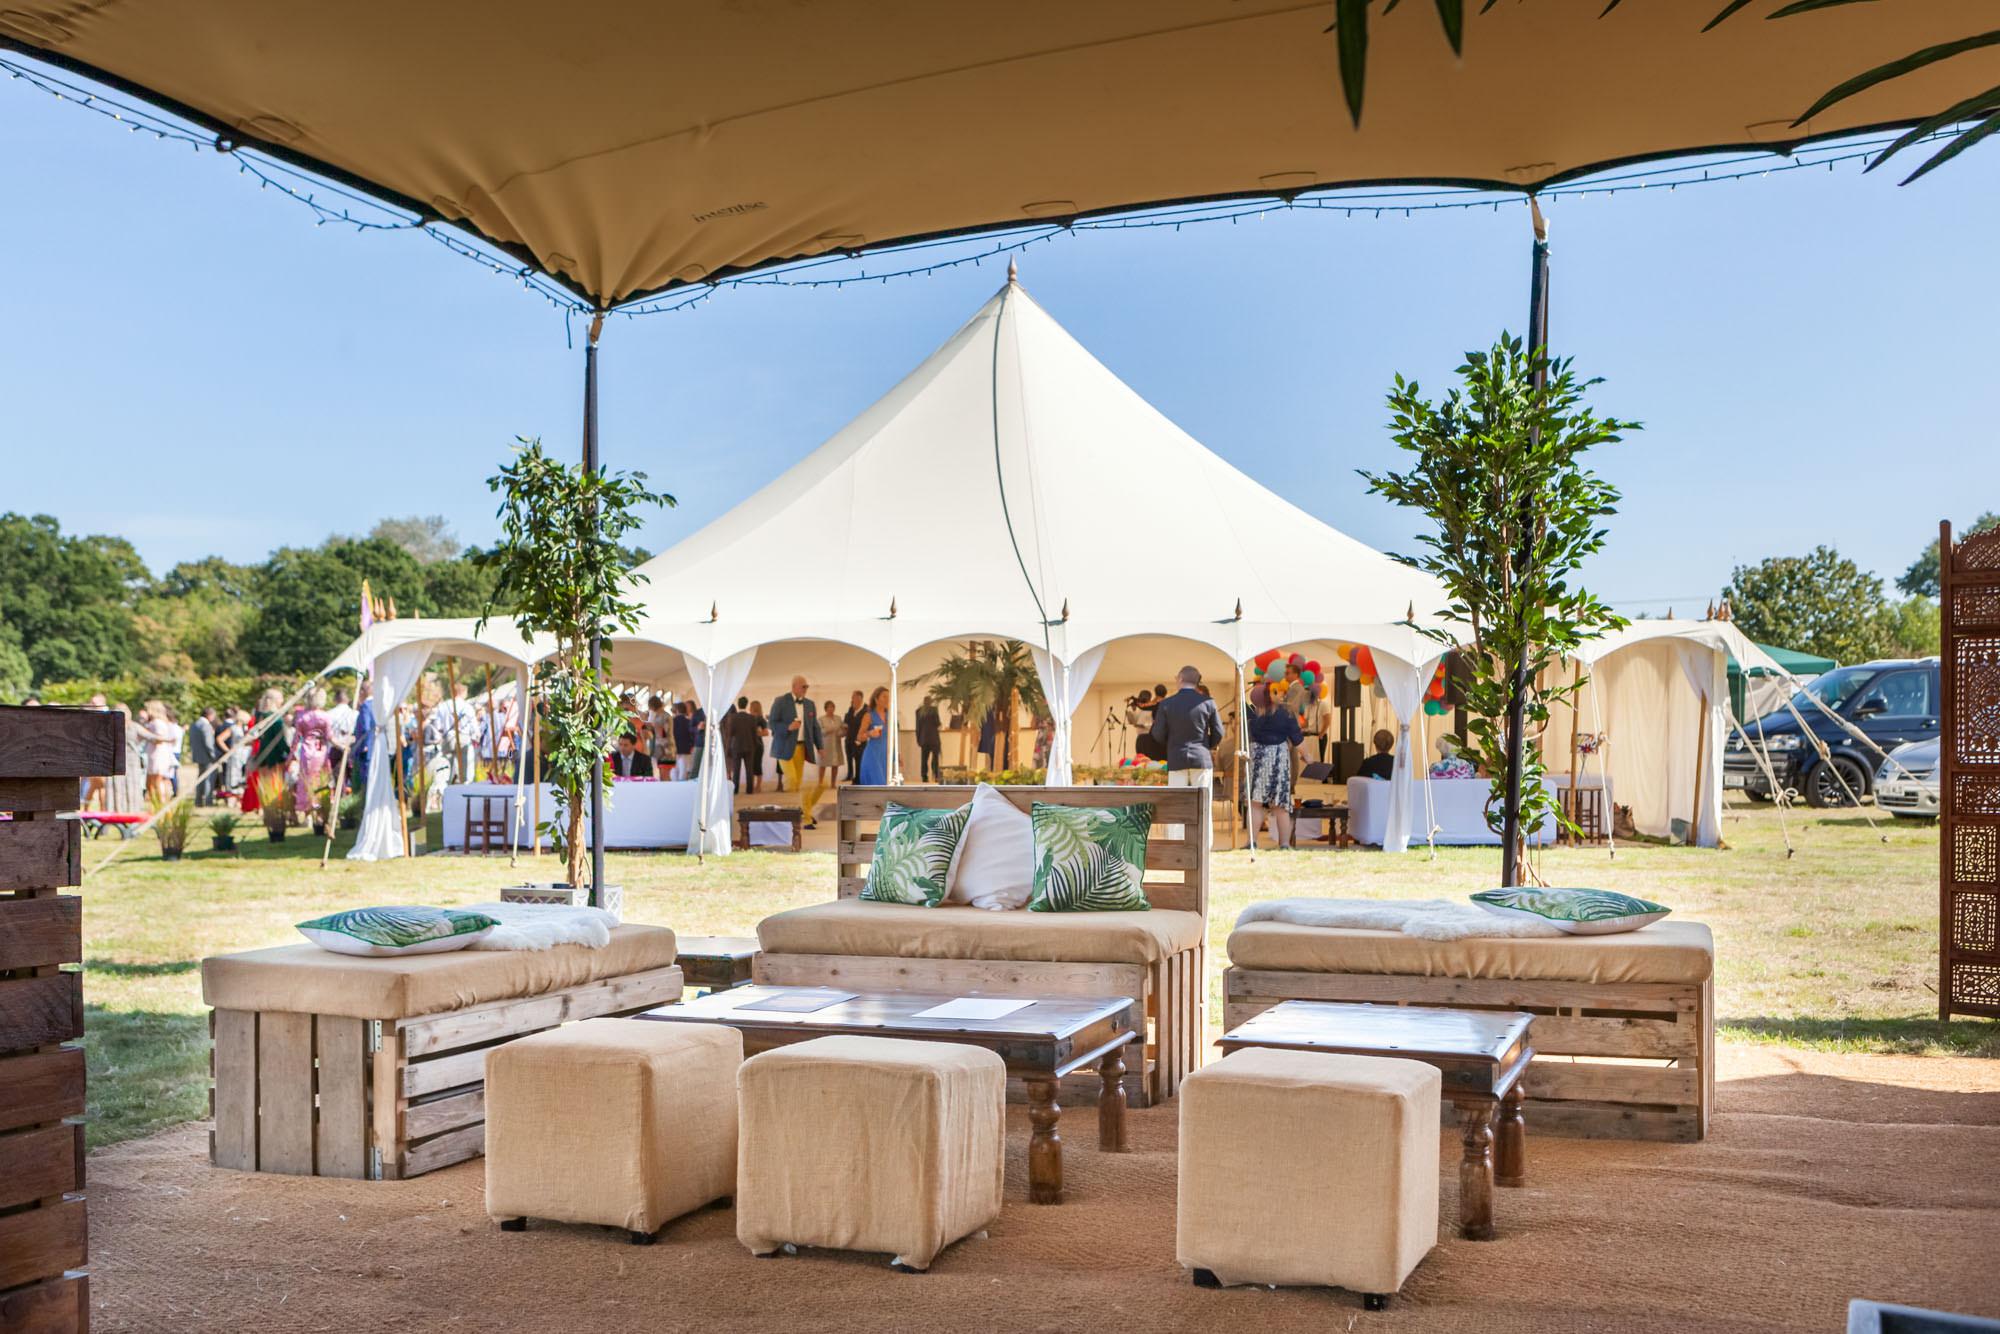 Arabian Tent Company - Unique, colourful wedding marquee + tent